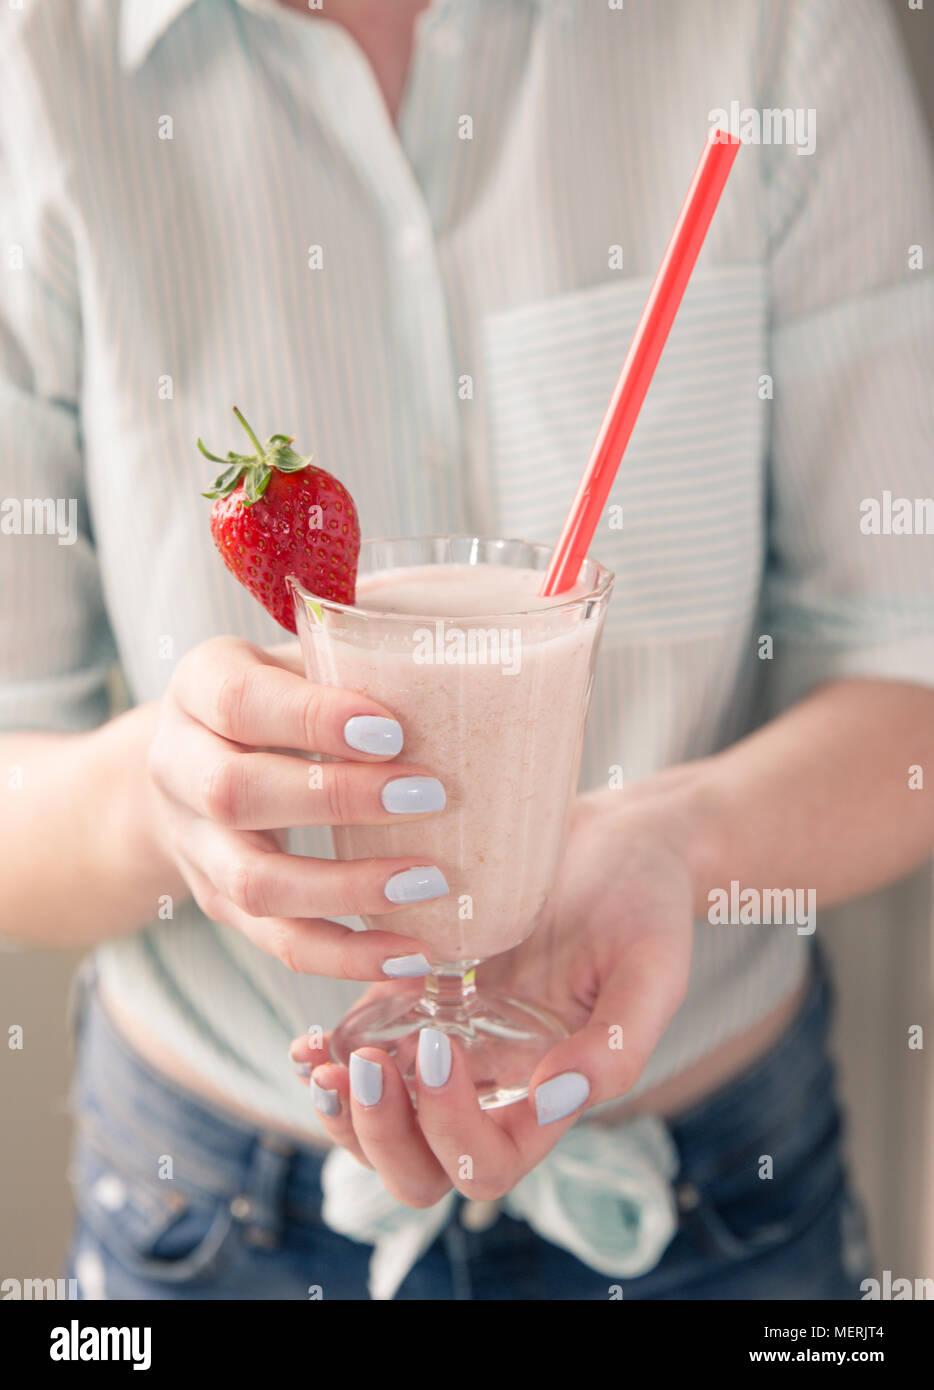 Strawberry Milkshake Girl Stock Photos Strawberry Milkshake Girl